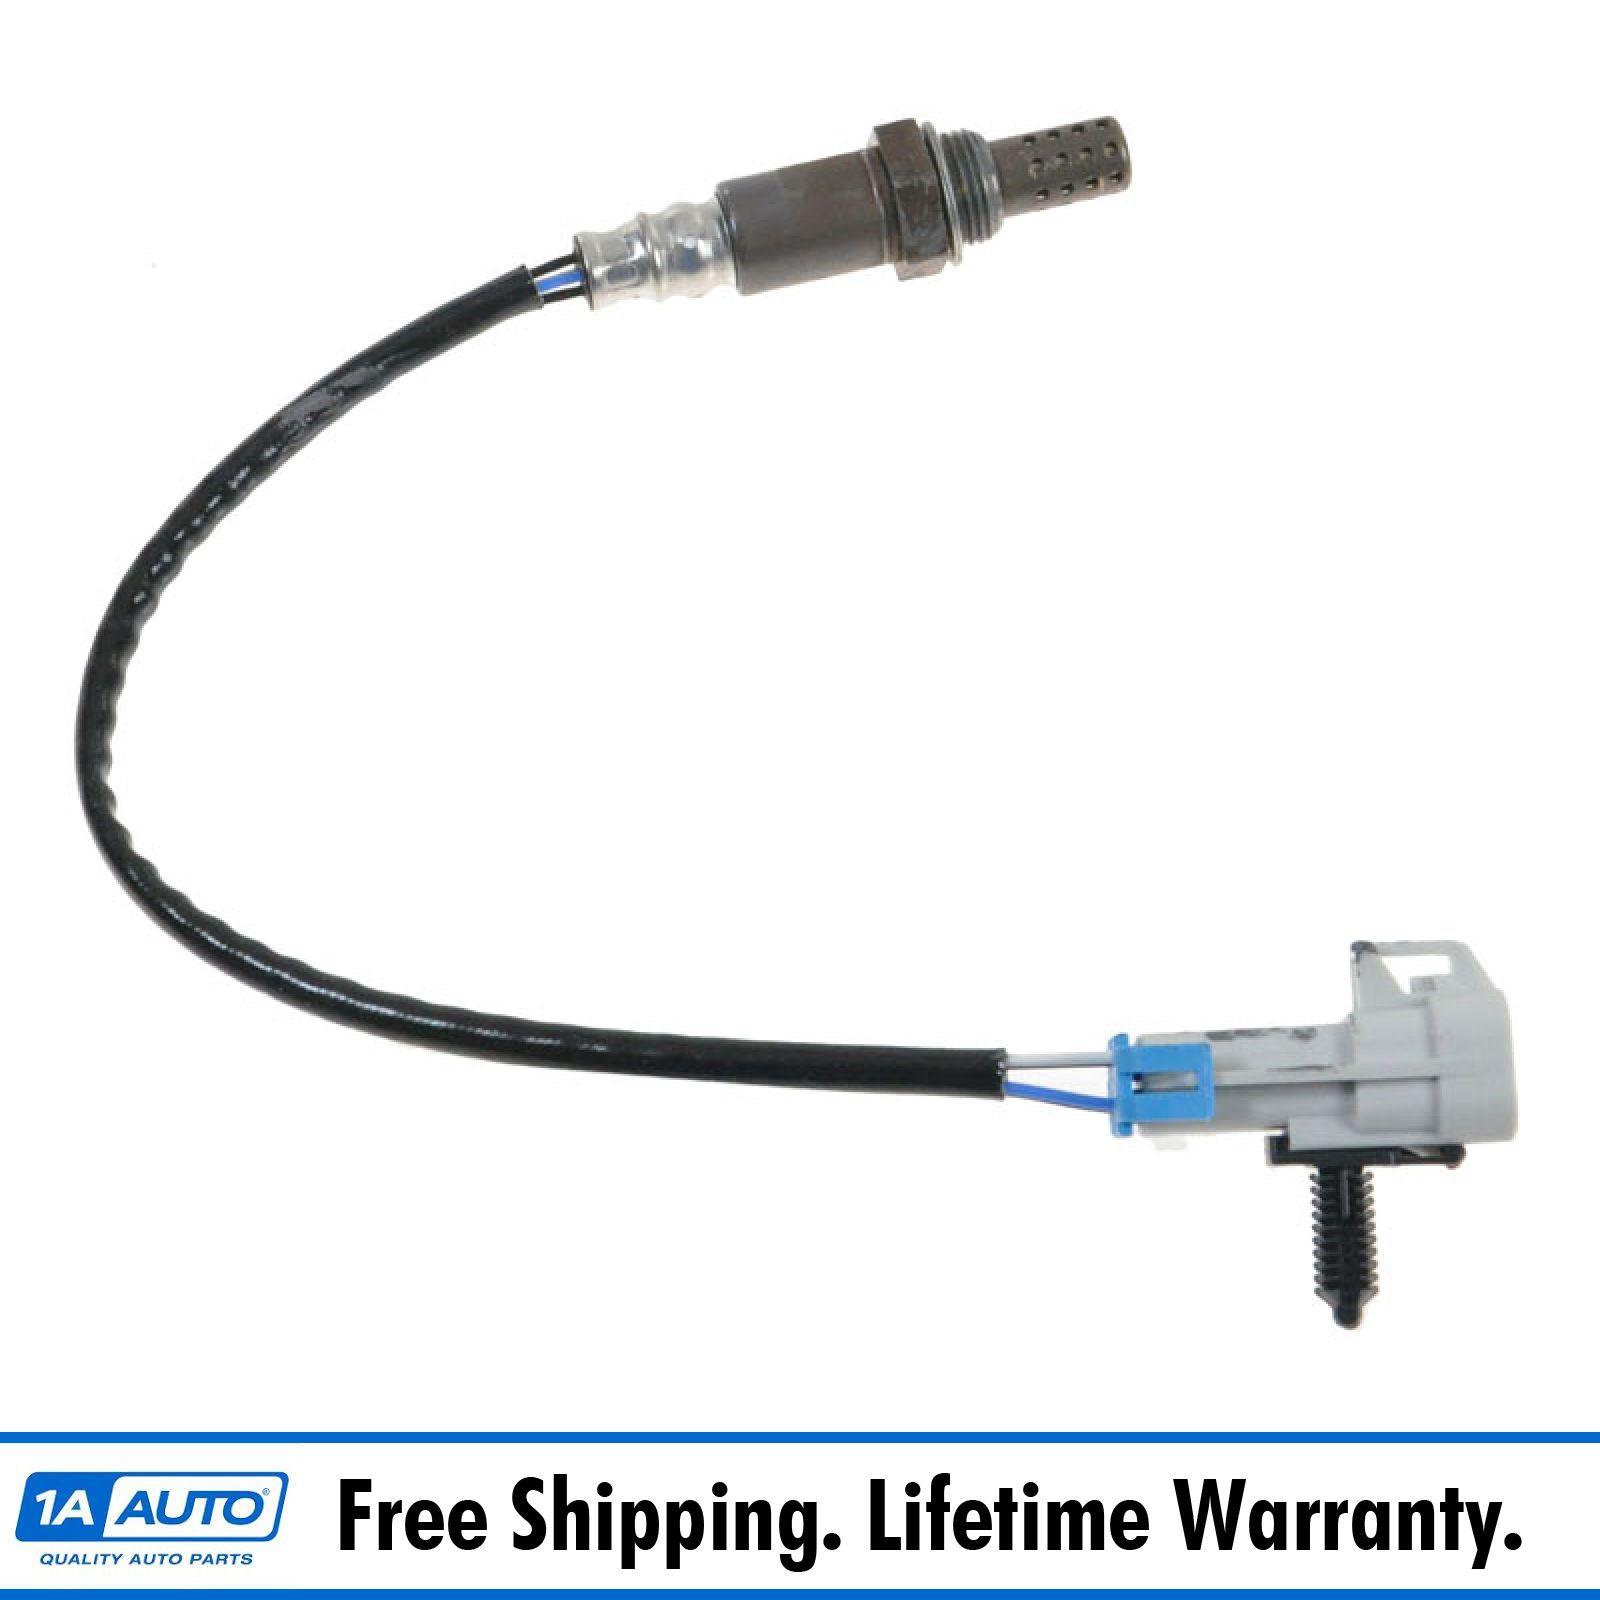 O2 Oxygen Sensor AC DELCO for Chevy GMC Cadillac Truck 02